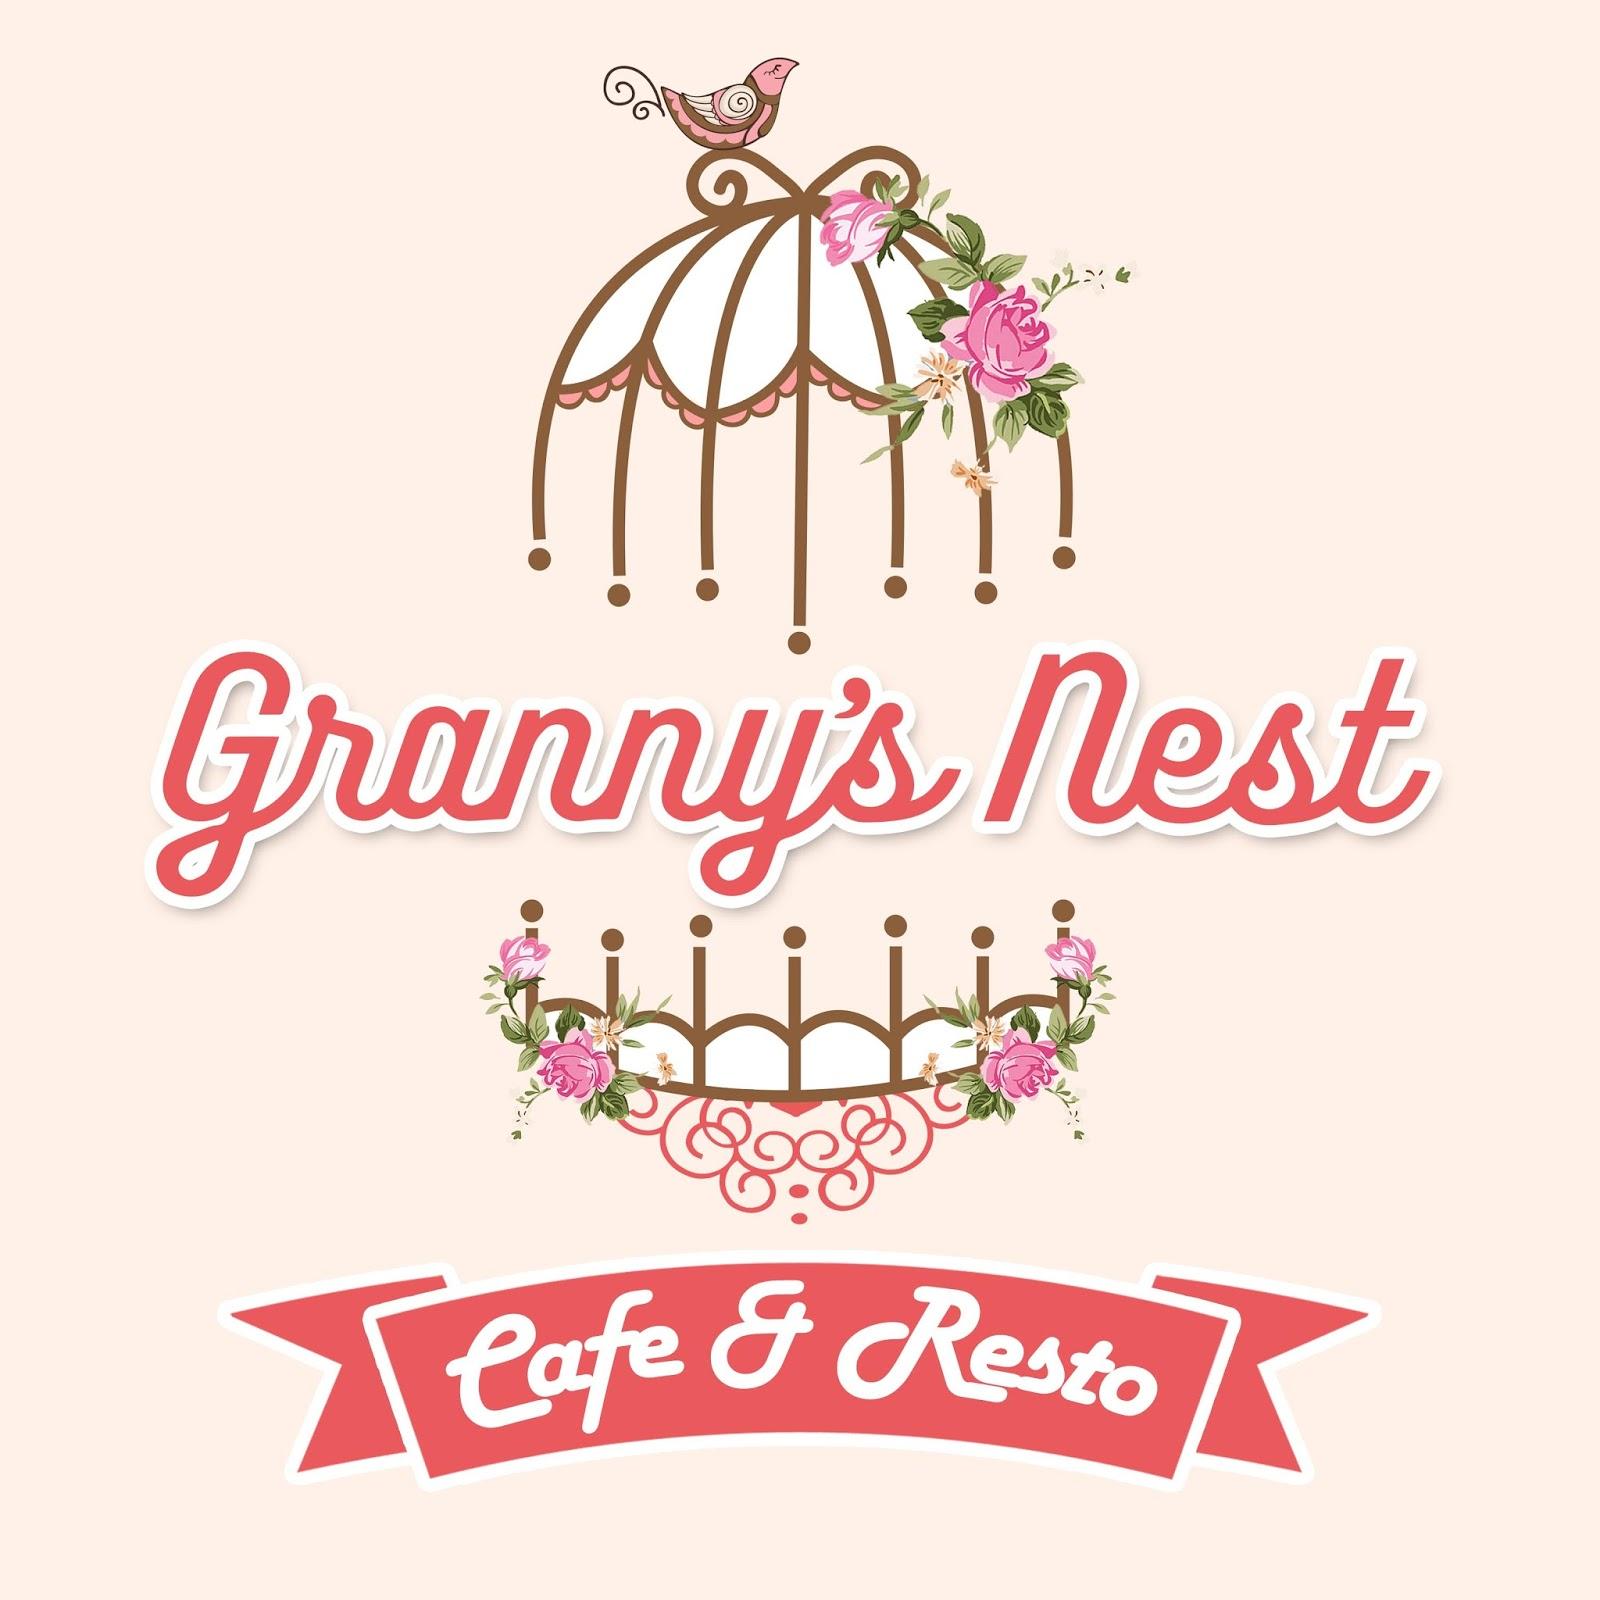 Lowongan Kerja Granny's Nest Cafe and Resto Bandar Lampung